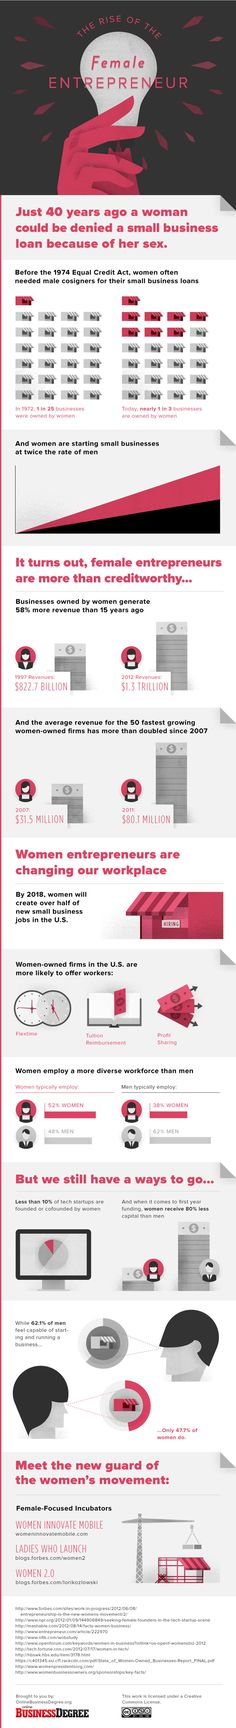 El ascenso de las mujeres emprendedoras #infografia #infographic #entrepreseurship